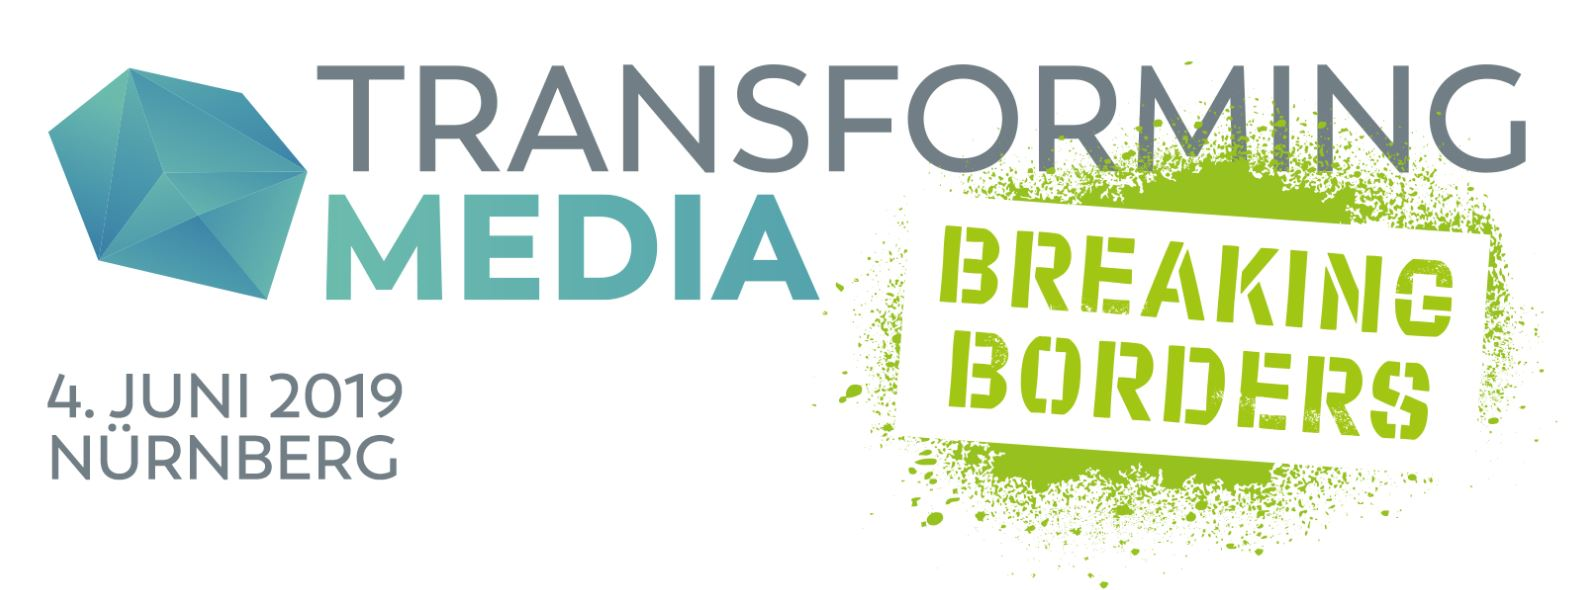 Transforming Media 2019 - Breaking Borders